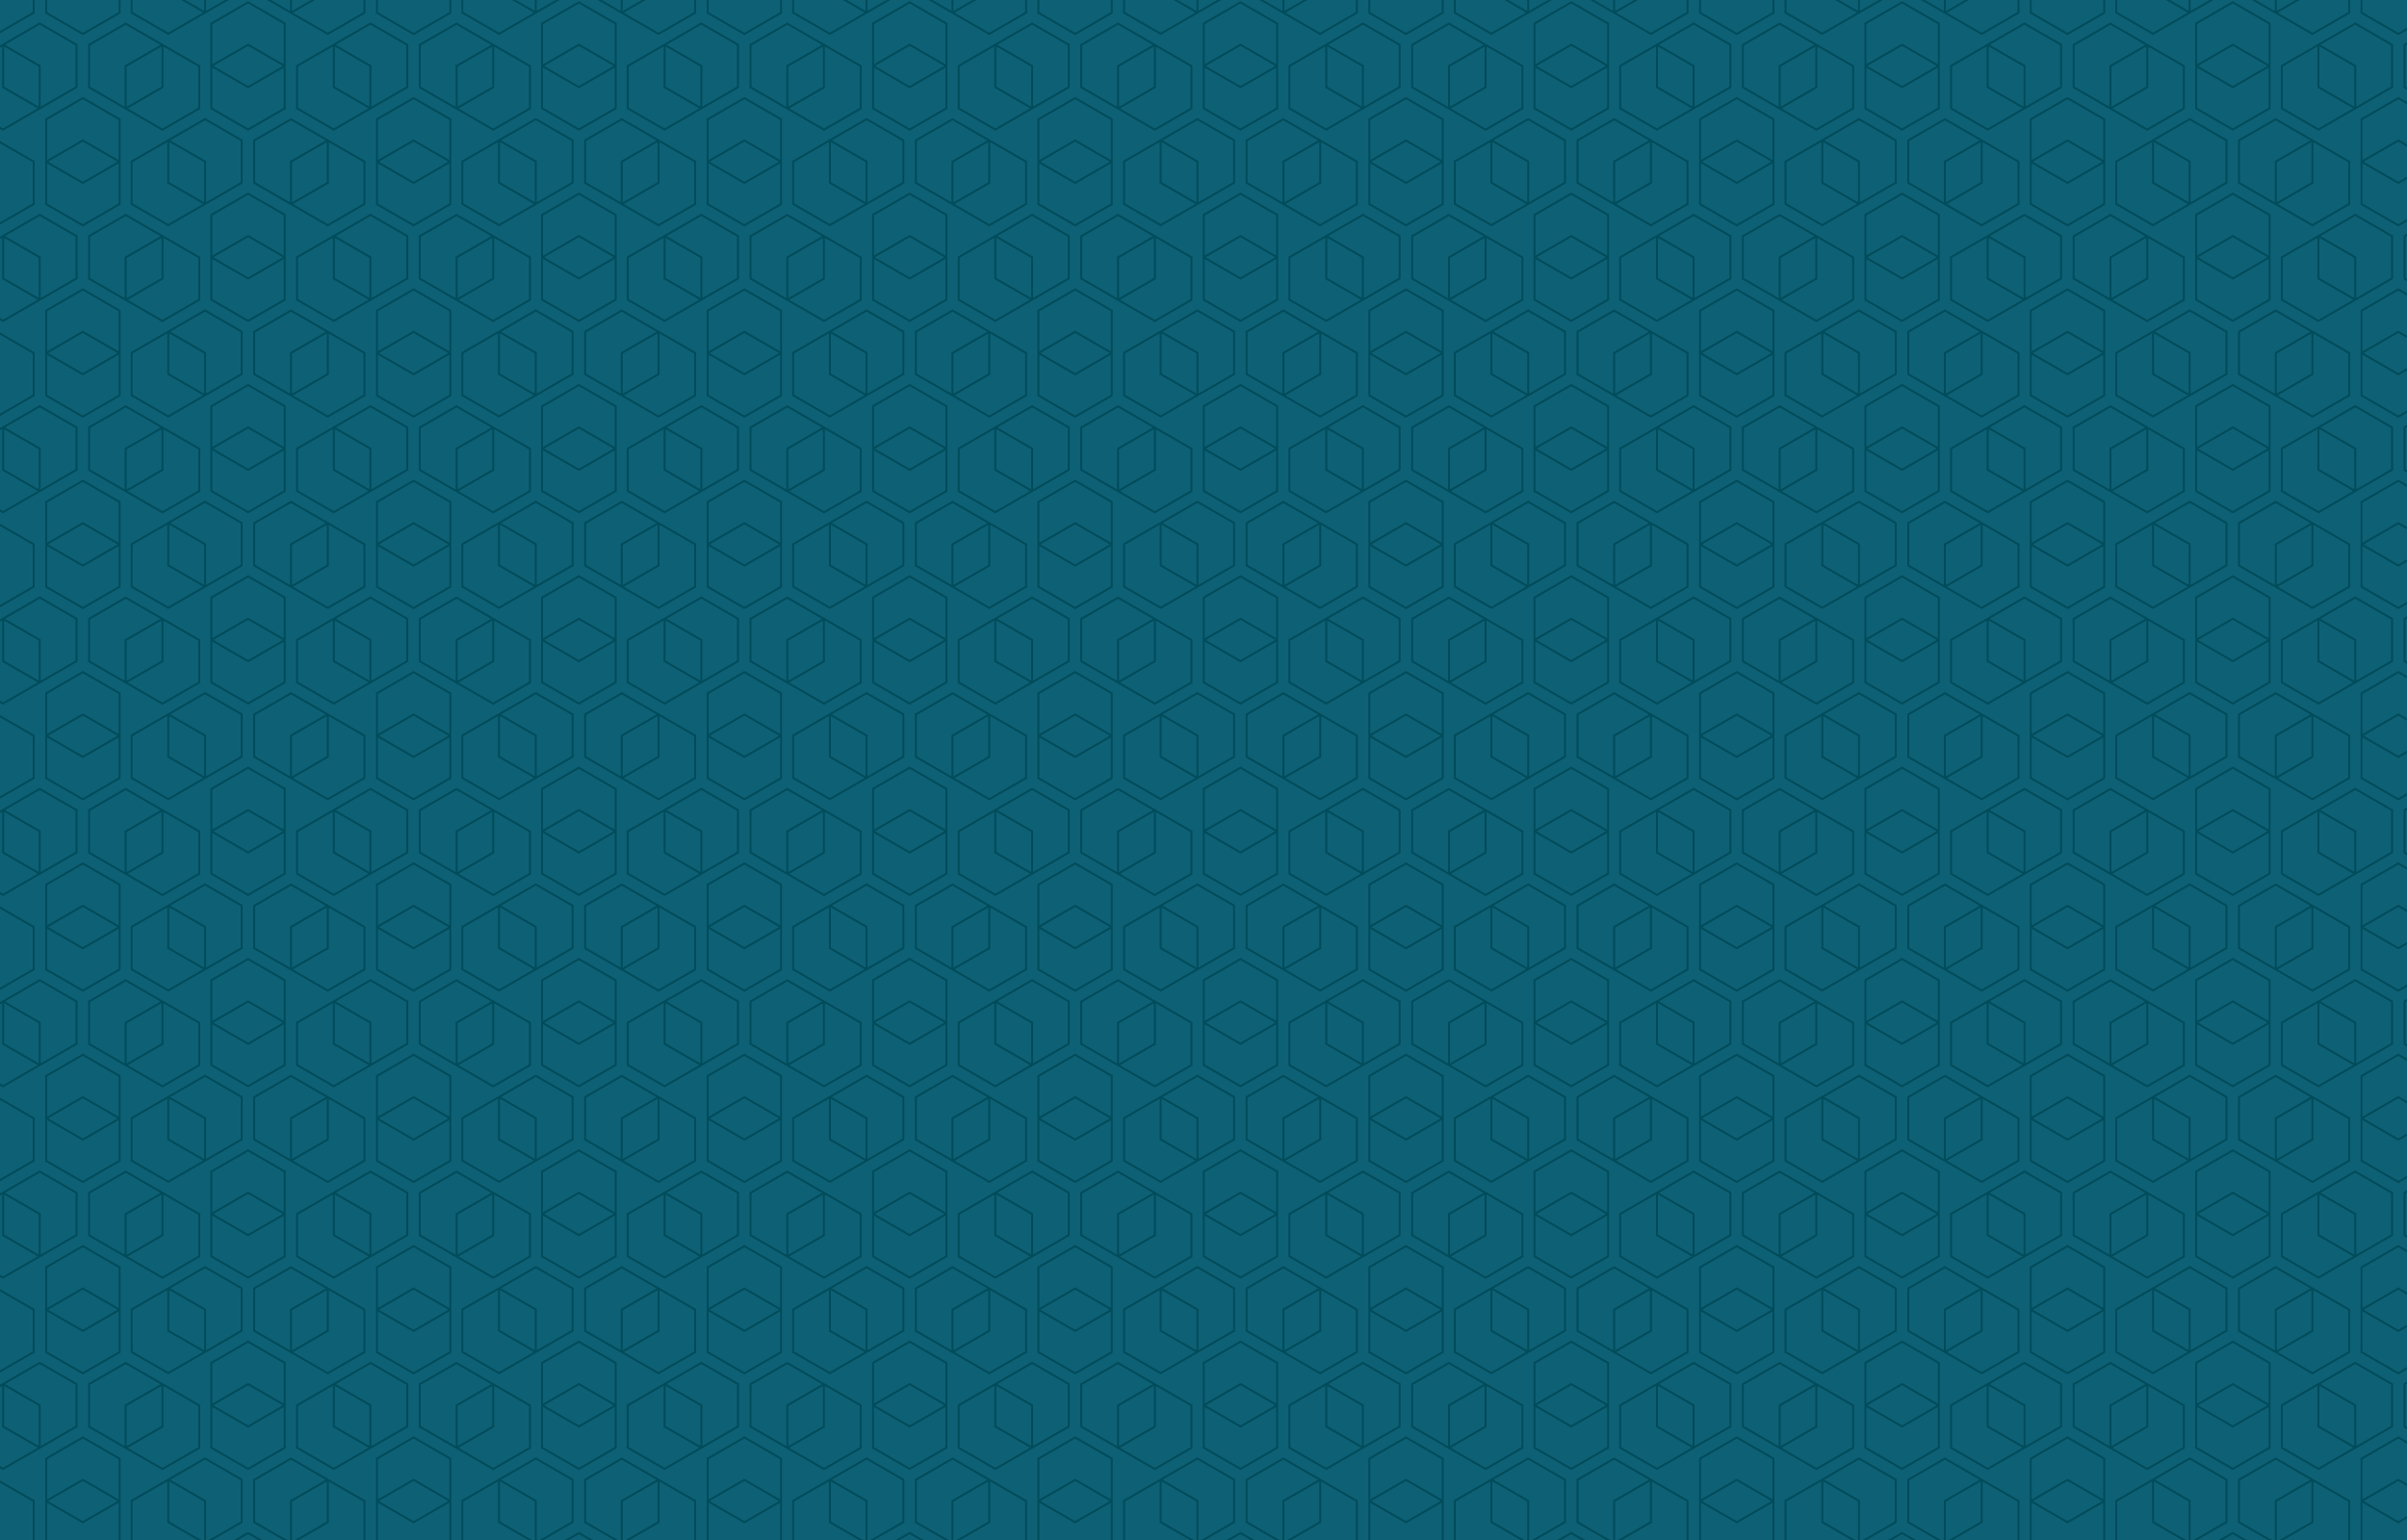 McCC-Hex-Pattern-Dark-Teal.png